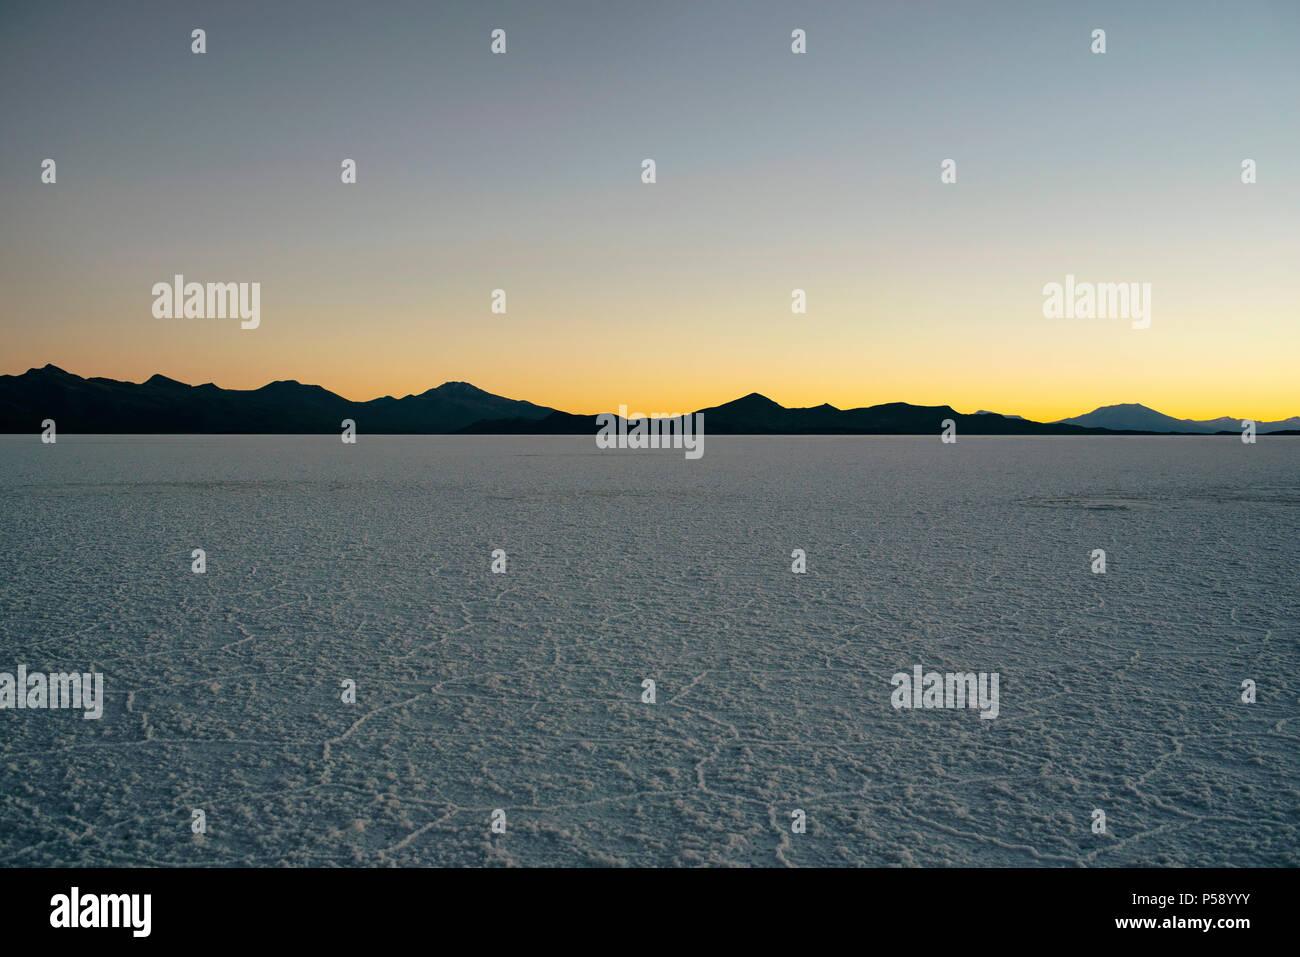 Sunset In The Salt Flats Salar De Uyuni Bolivia South